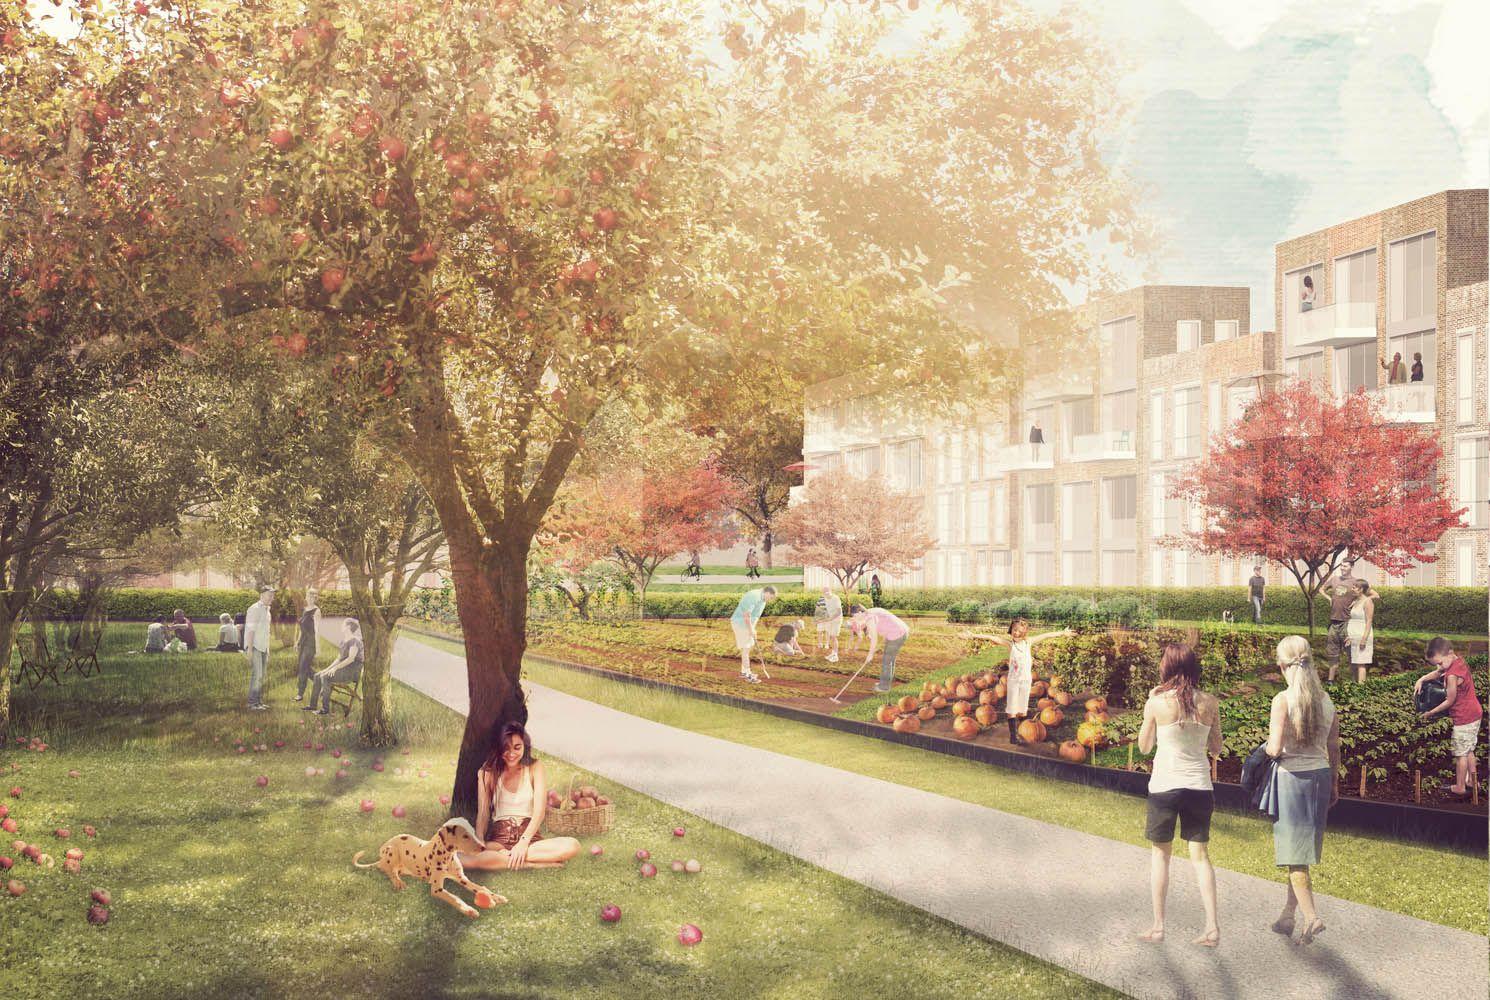 sinai perspektive hebebrandquartier outdoor landscape architecture st dtebau. Black Bedroom Furniture Sets. Home Design Ideas